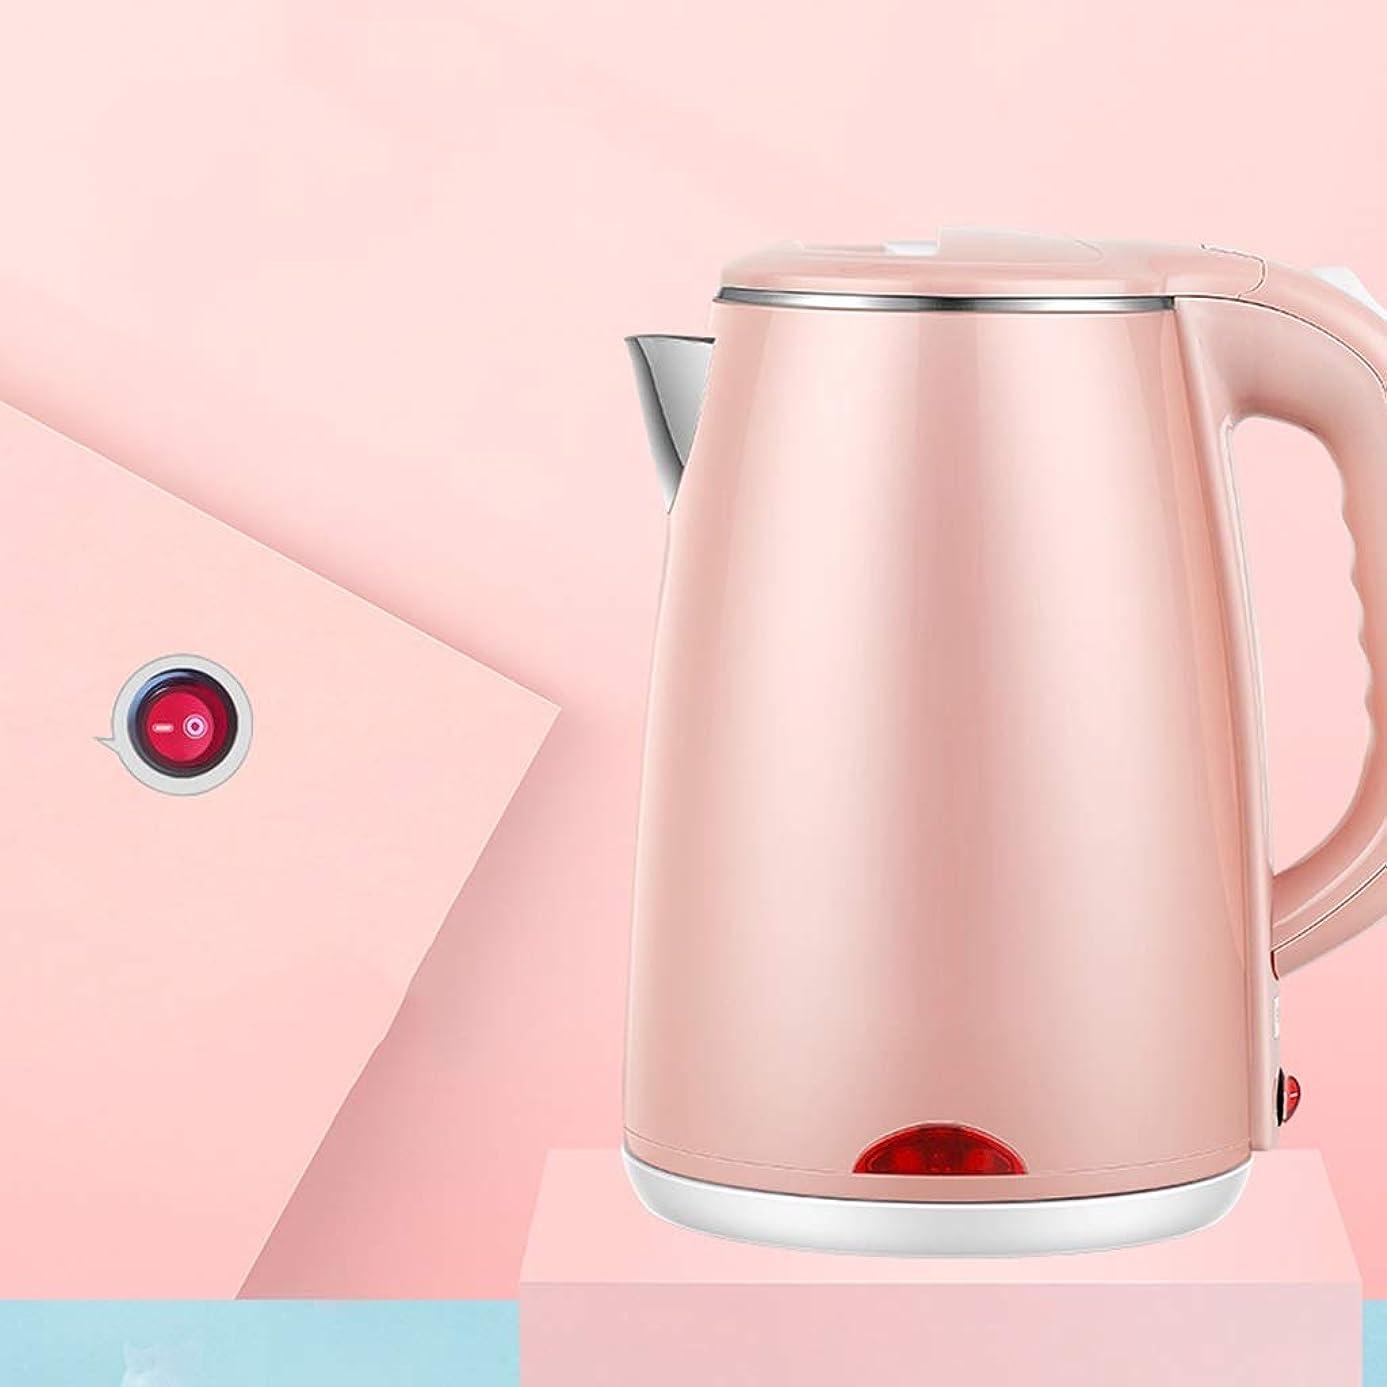 TXOZ 断熱一体型電気ケトル、2.0L大容量軽音沸騰水、24時間保温70度、繰り返し沸騰しない 電気湯沸かし器 (Color : Pink)